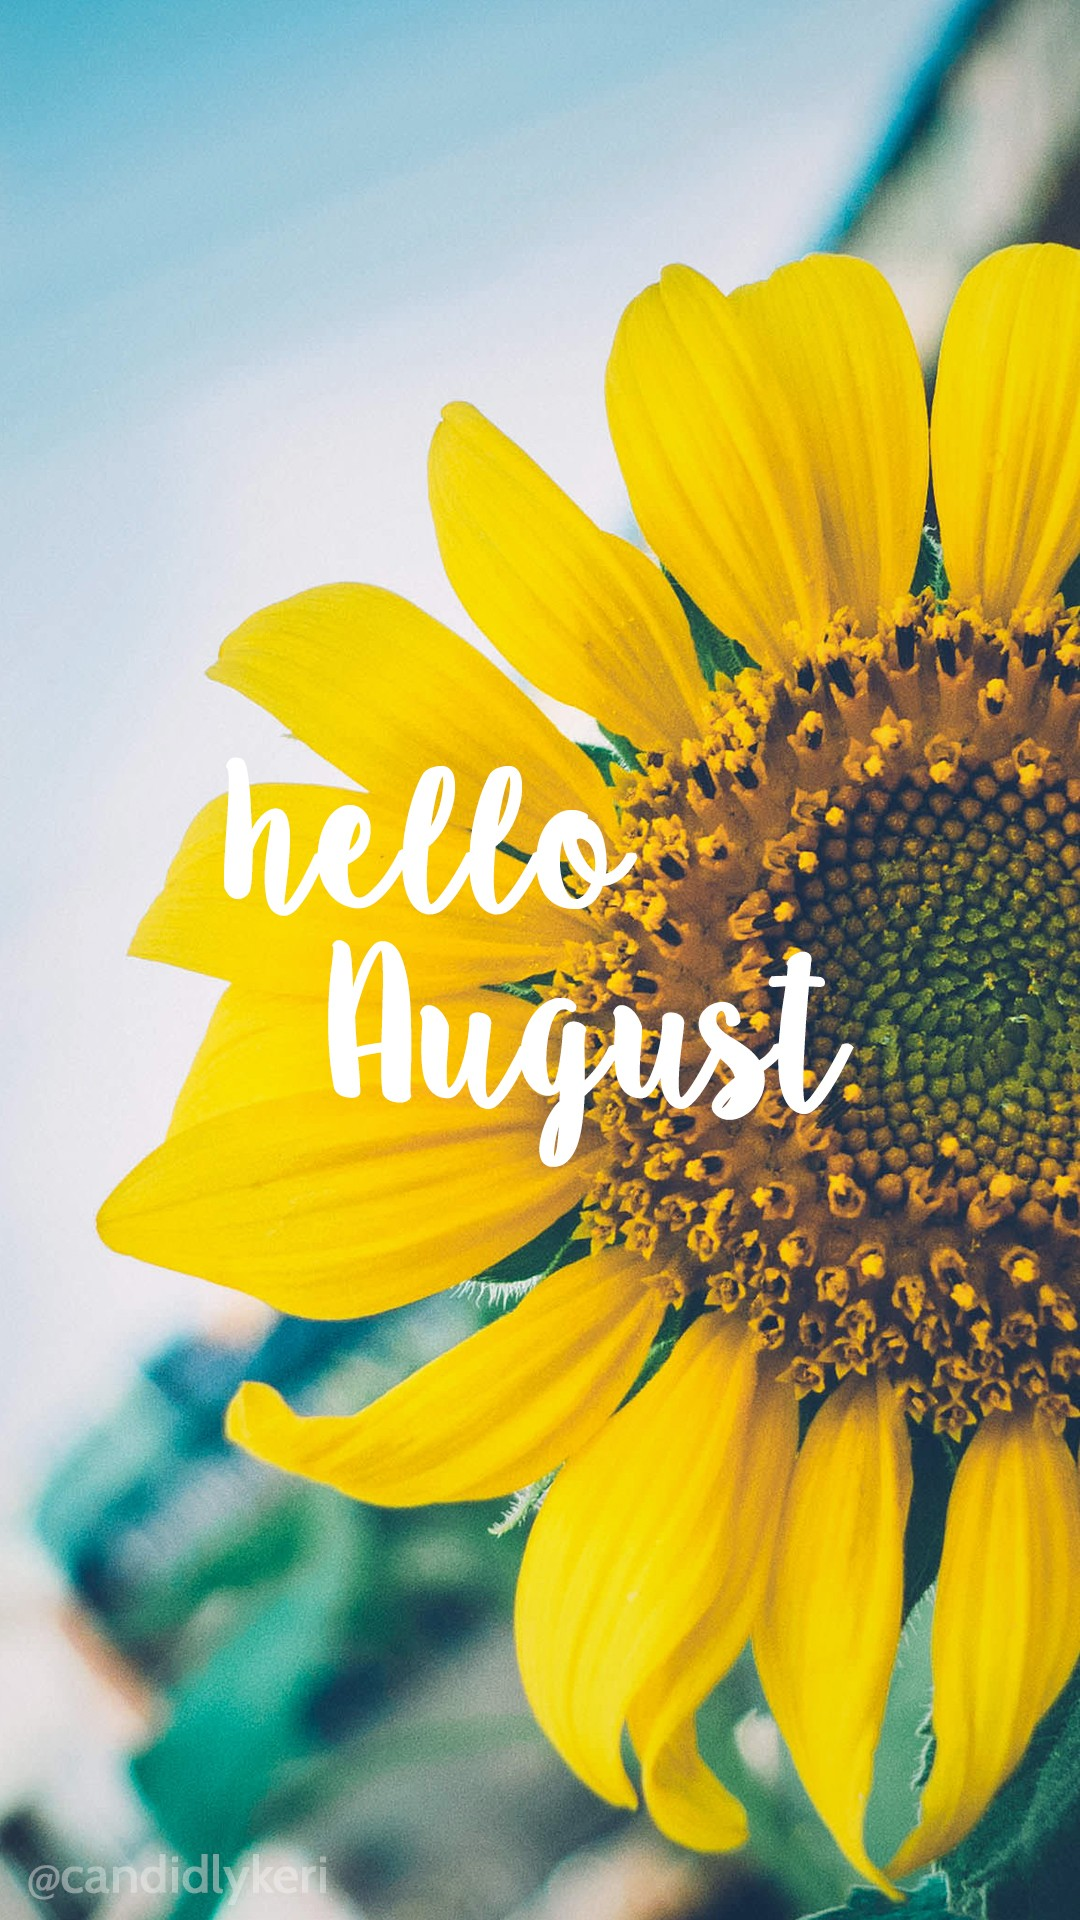 Happy Bright Wallpaper : happy, bright, wallpaper, Hello, August, Sunflower, Bright, Happy, Background, 1080x1920, Download, Wallpaper, WallpaperTip